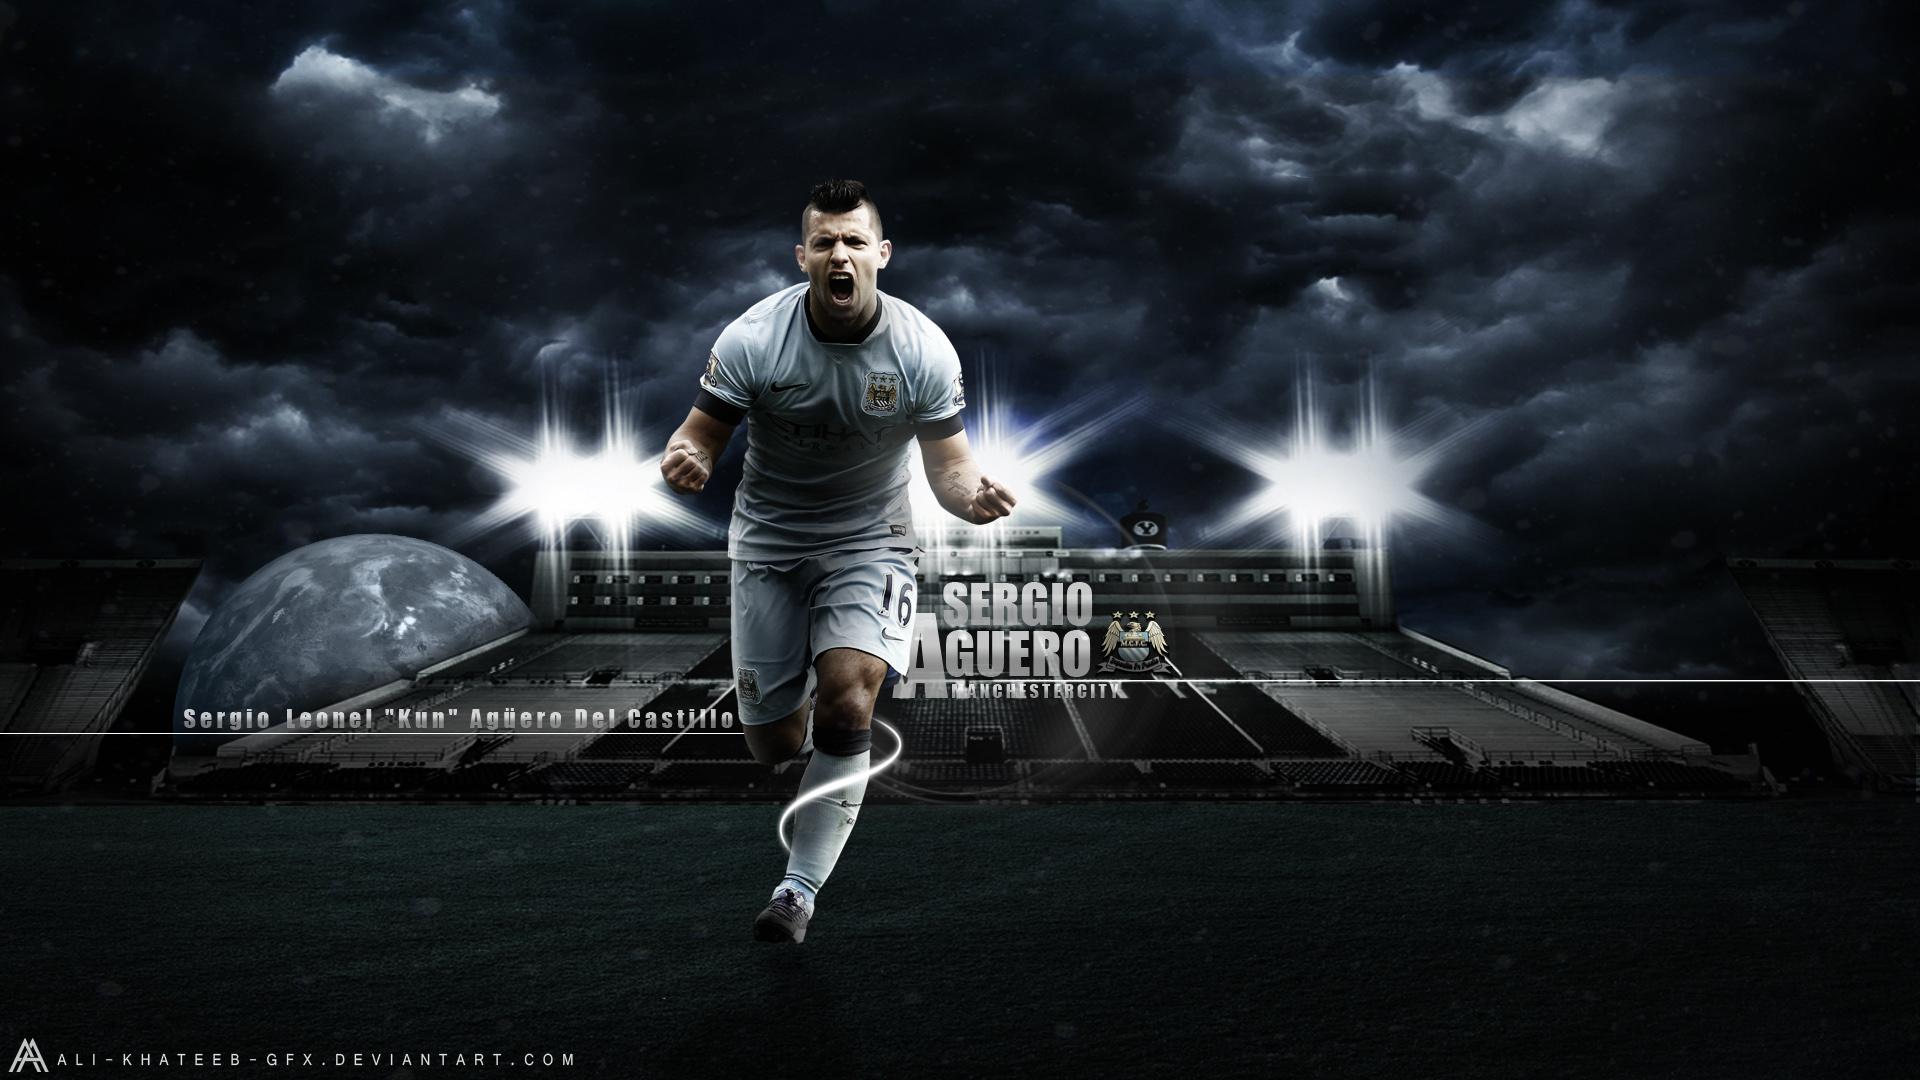 Download Sergio Aguero Manchester City Player HD Wallpaper Search 1920x1080